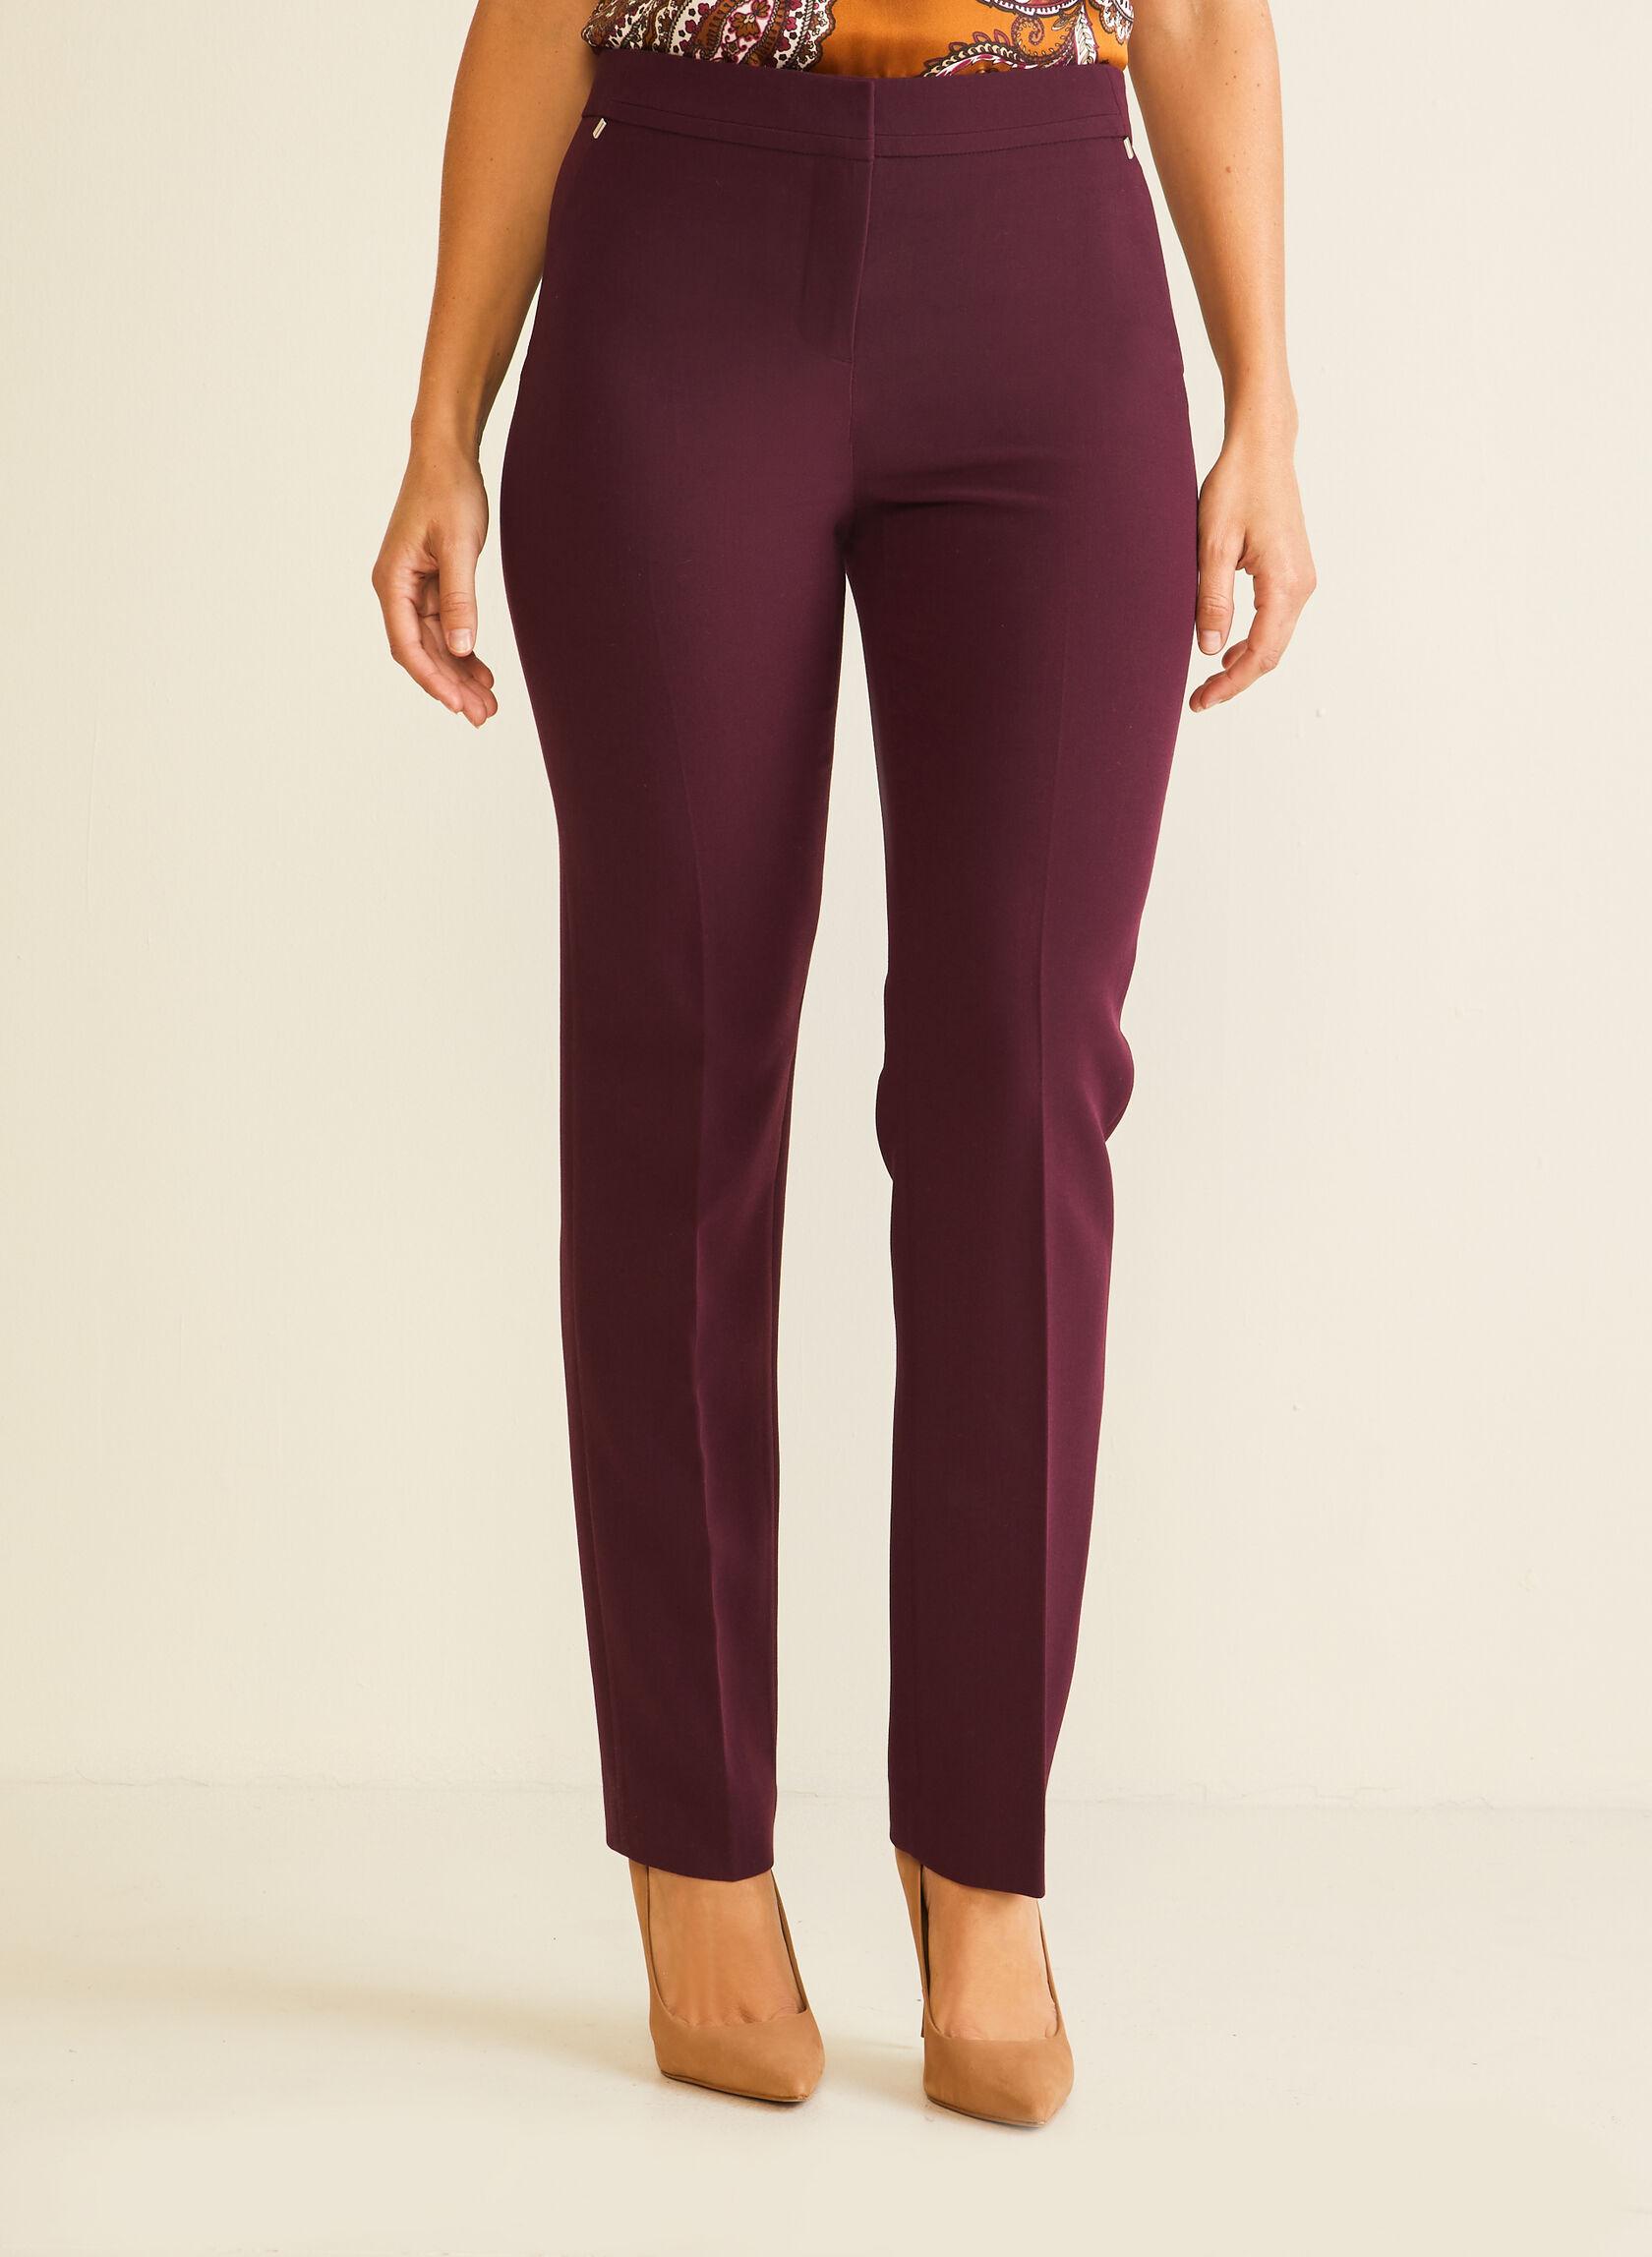 Pantalon coupe moderne à jambe droite